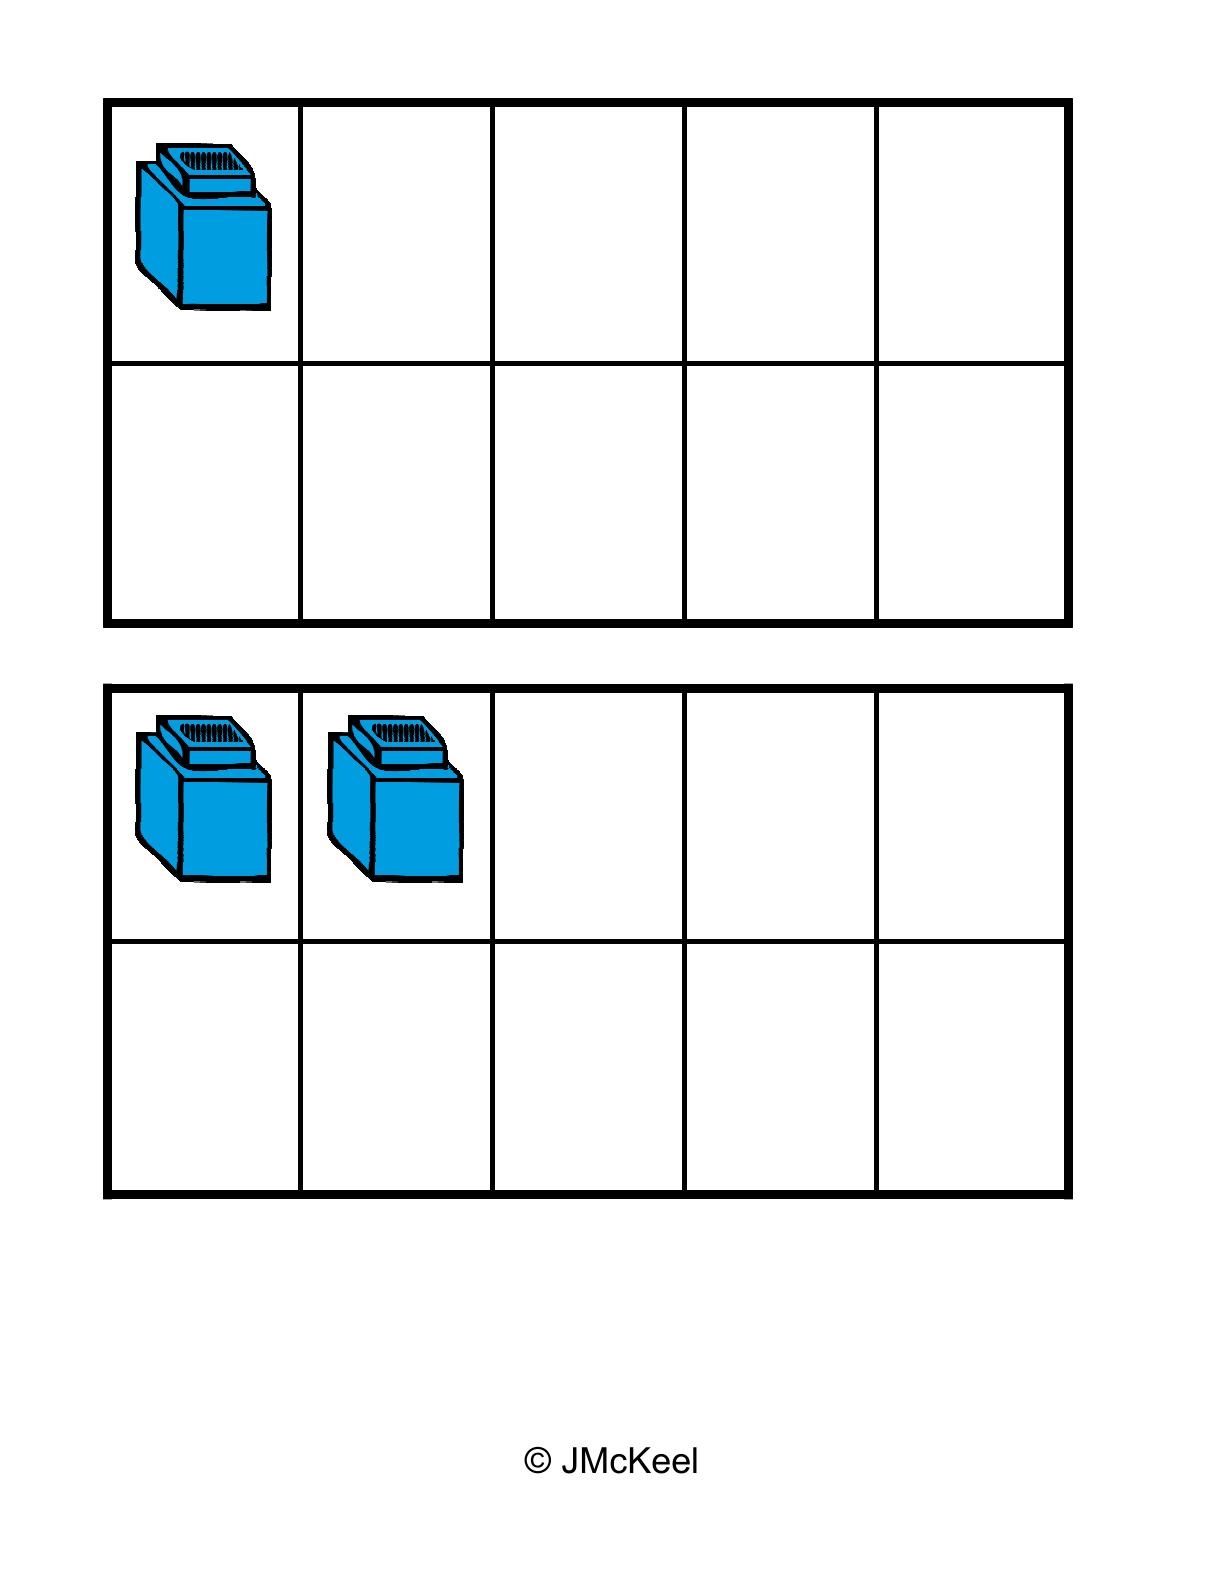 Unifix Cubes Clipart Amp Look At Clip Art Images